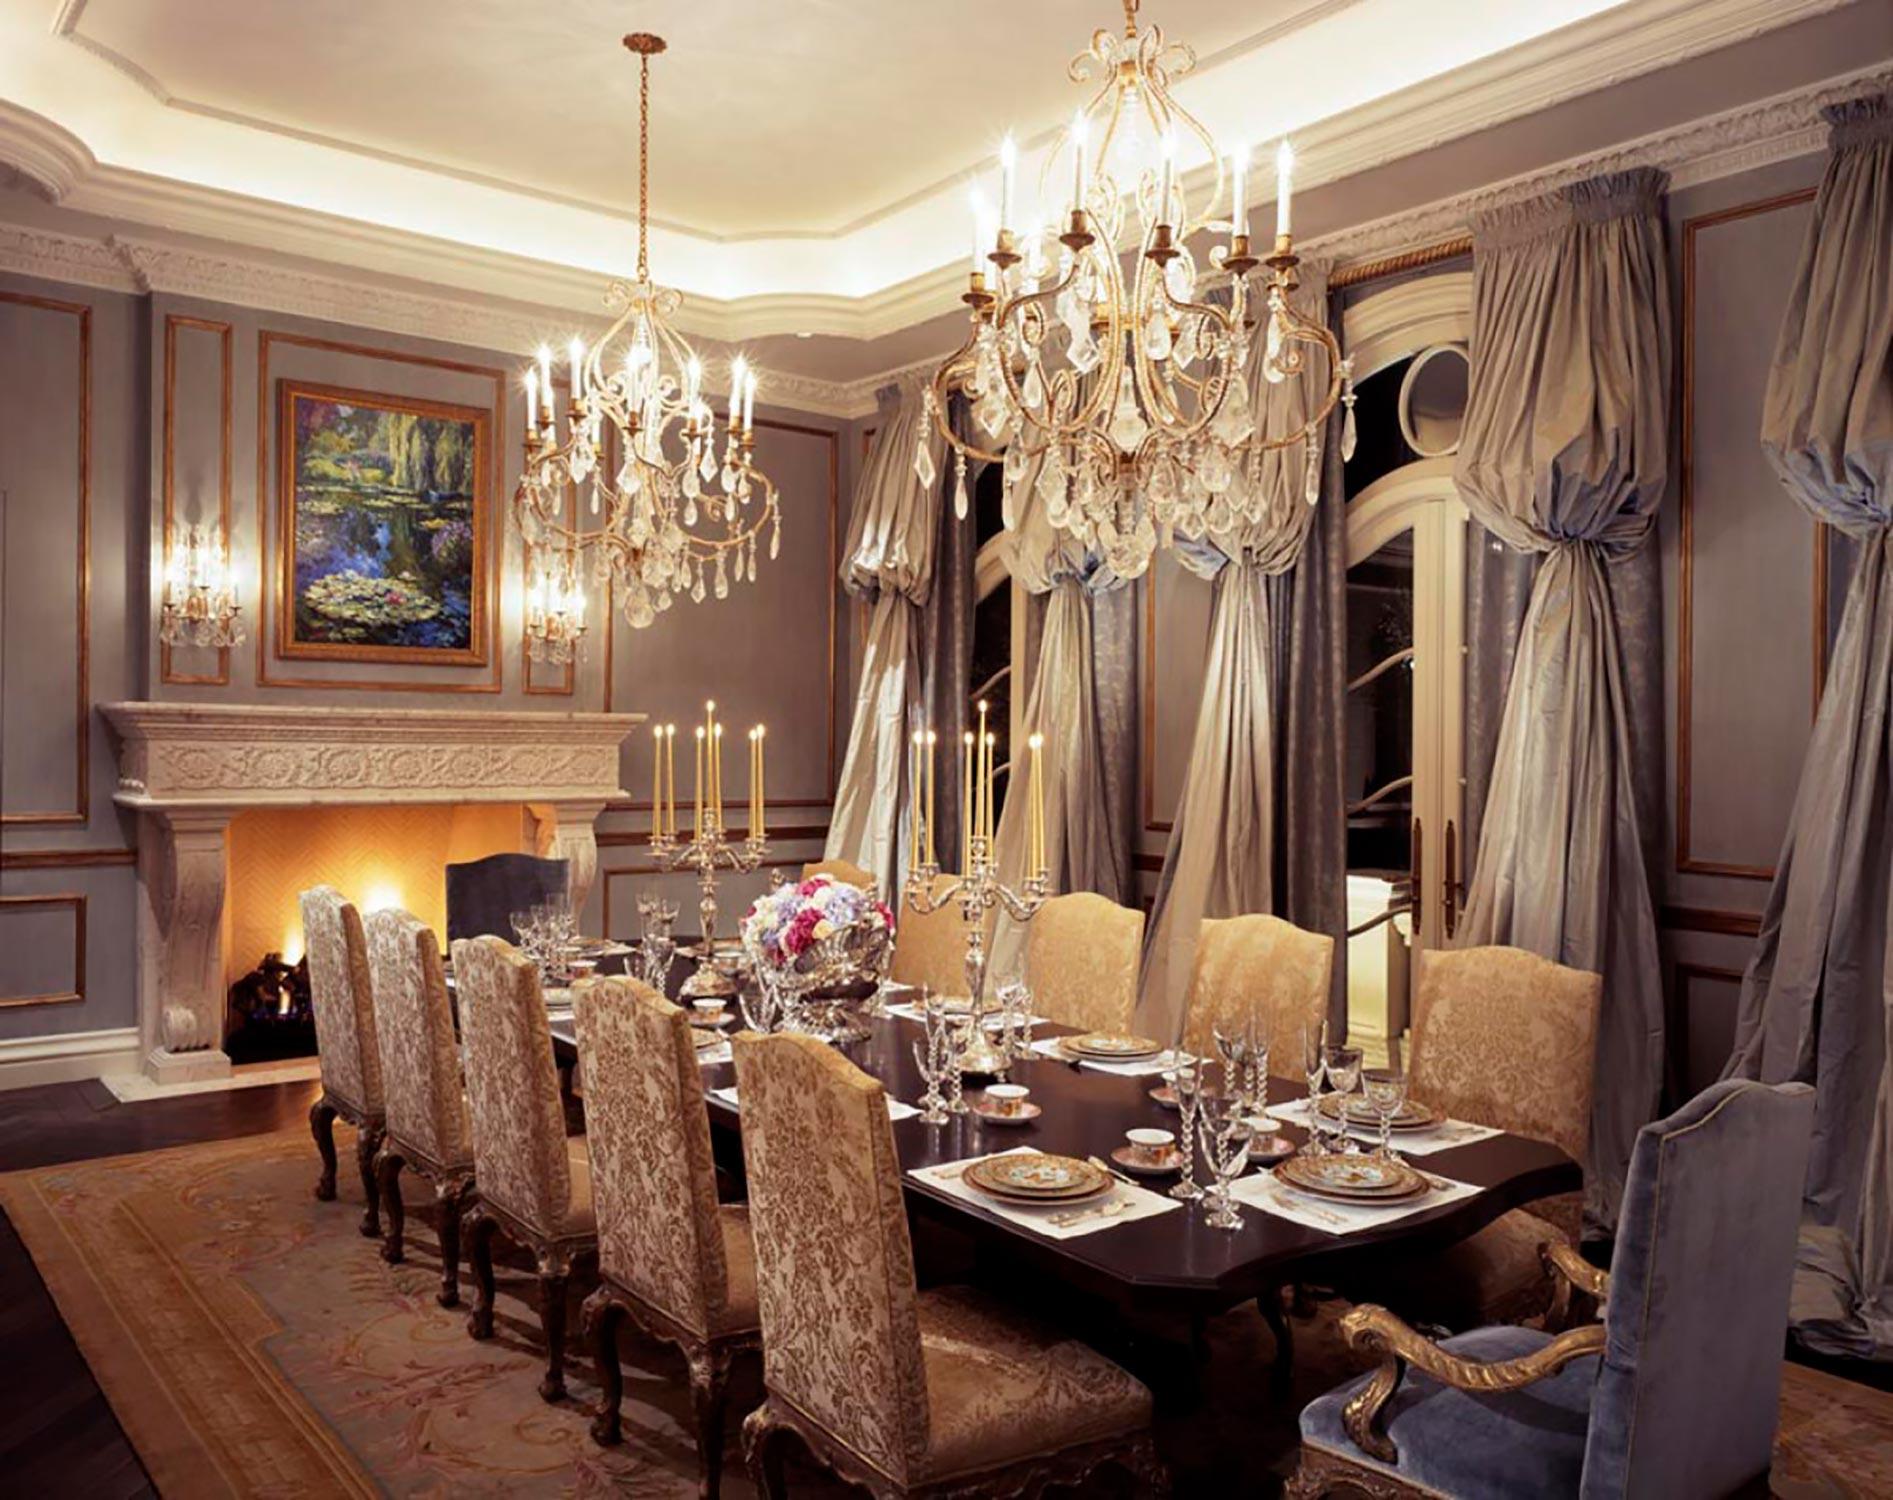 window treatments, upholstery & throw pillows  Interior Design: Howard Design Group